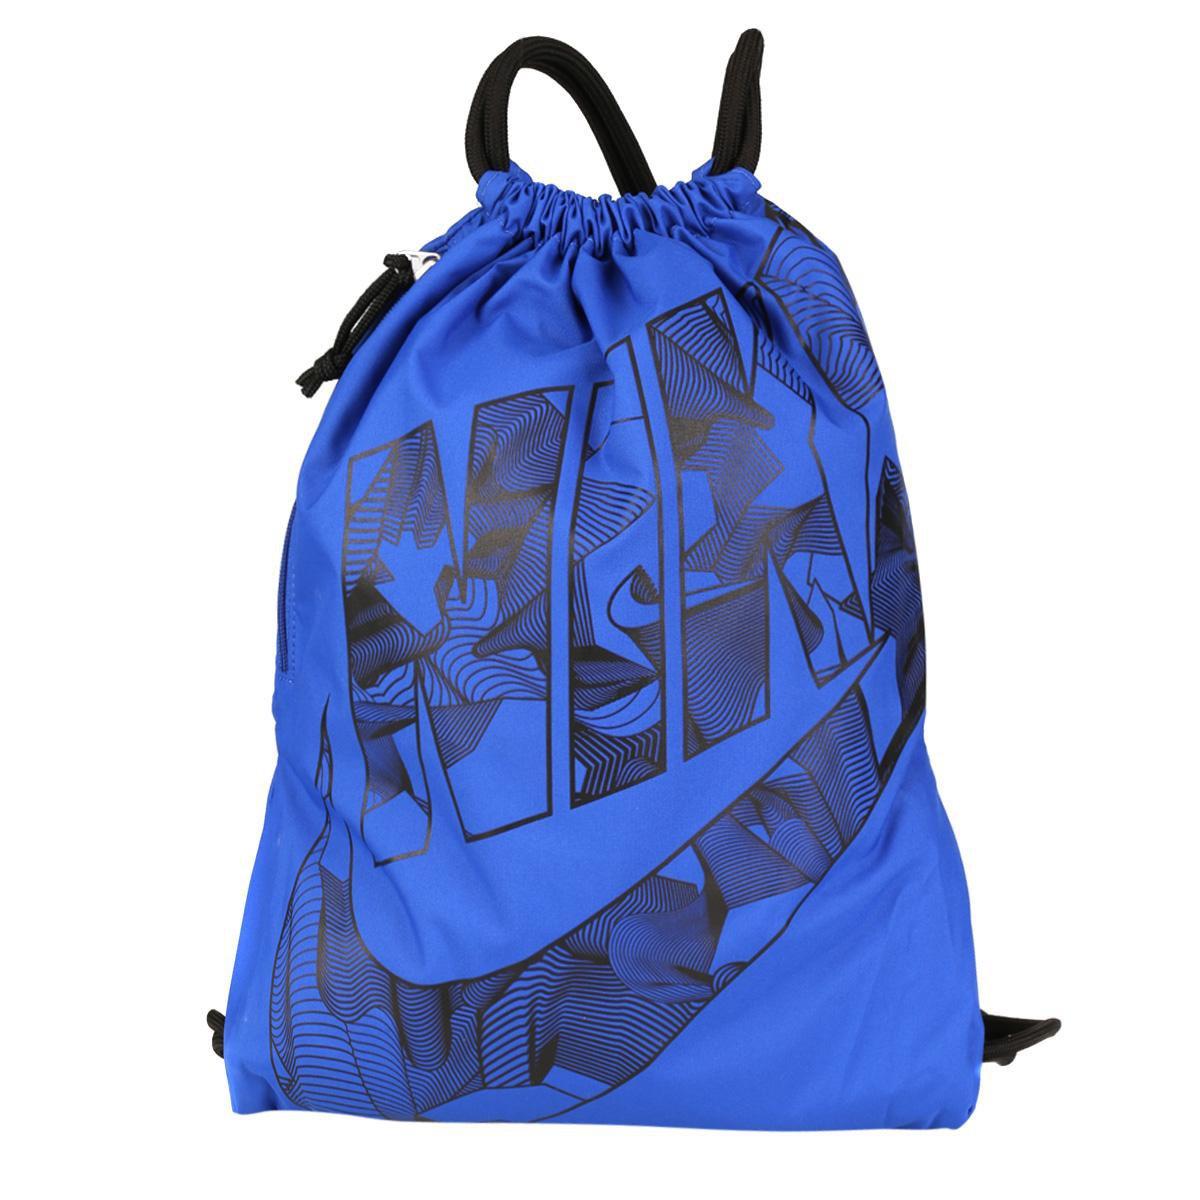 f1e74b6d0 Sacola Nike Heritage Gymsack Feminina - Compre Agora